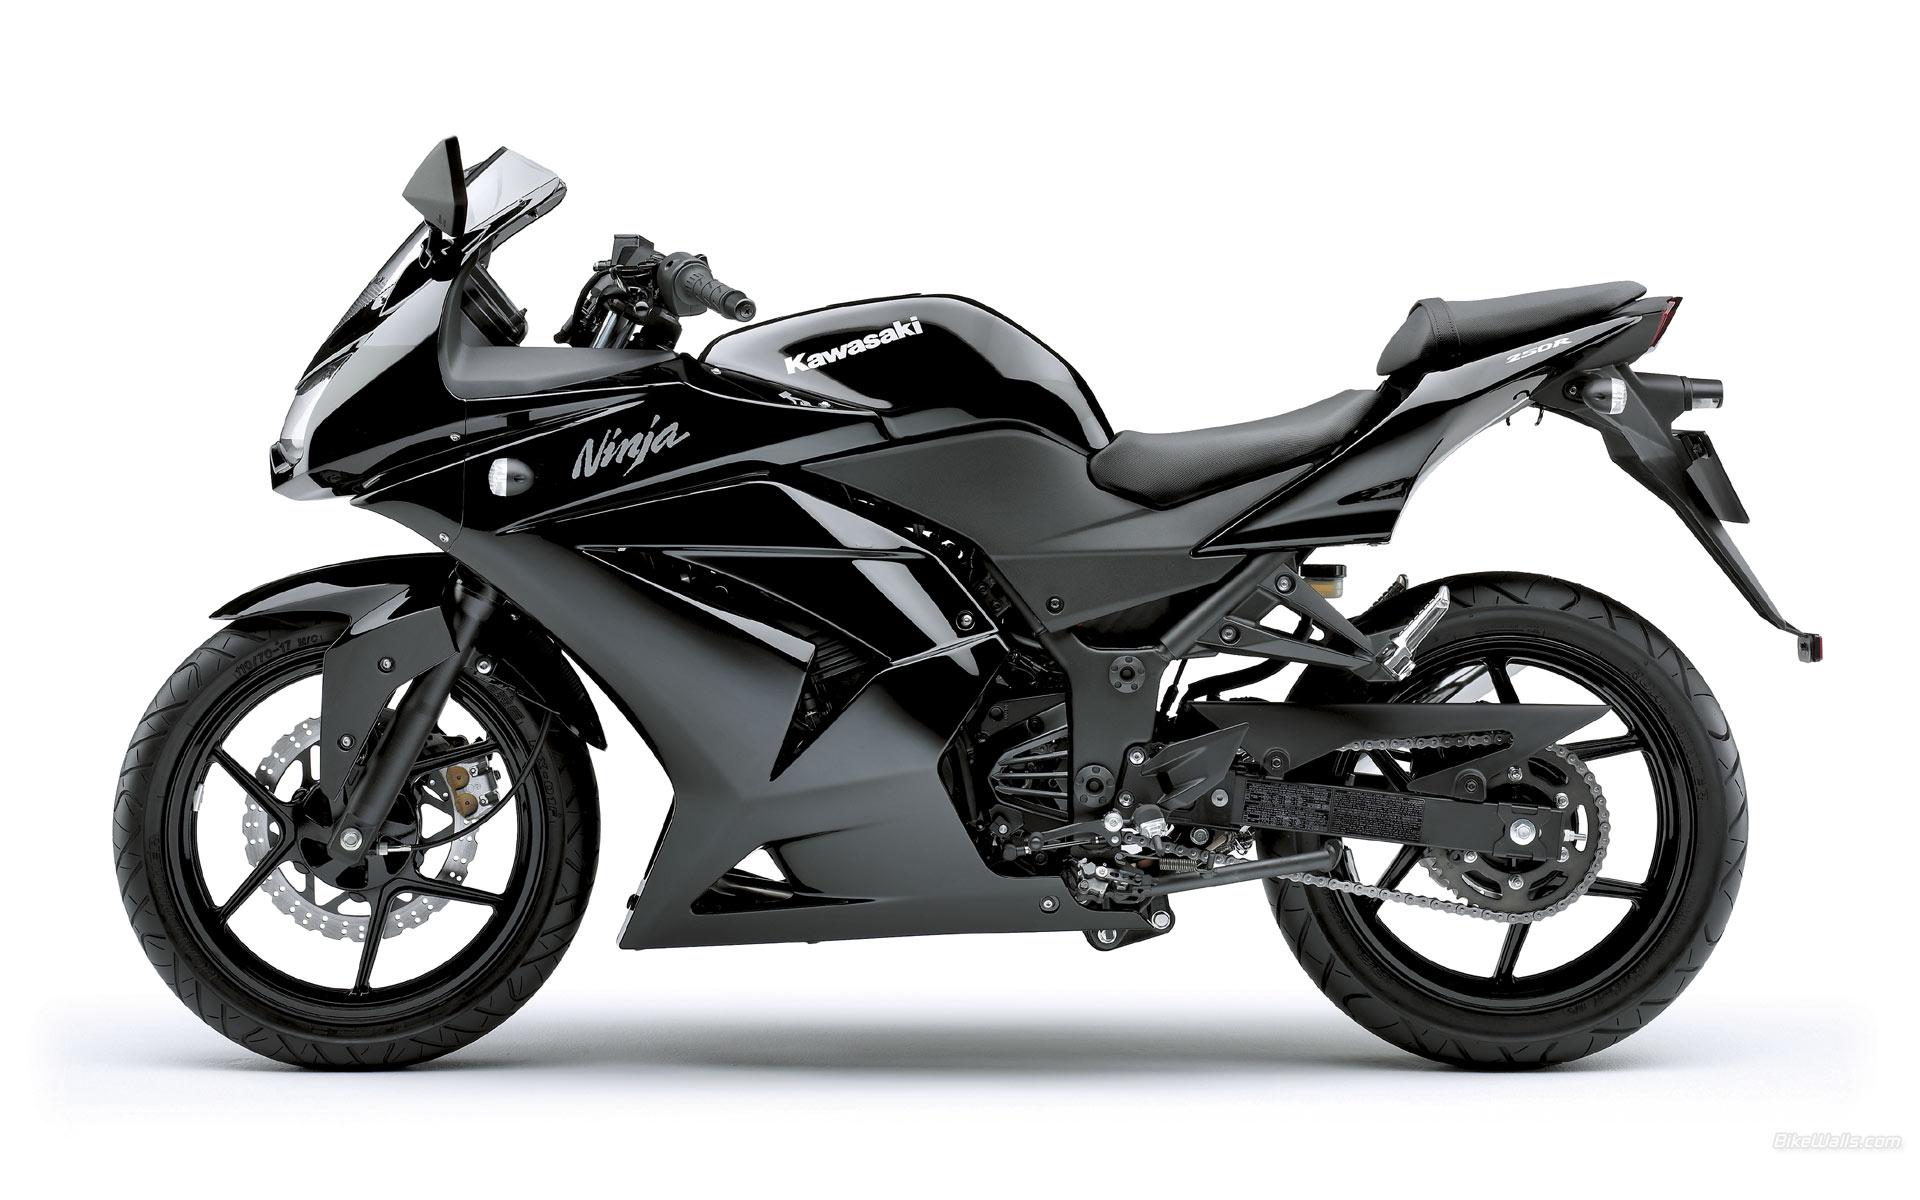 Kawasaki Ninja 250R Black